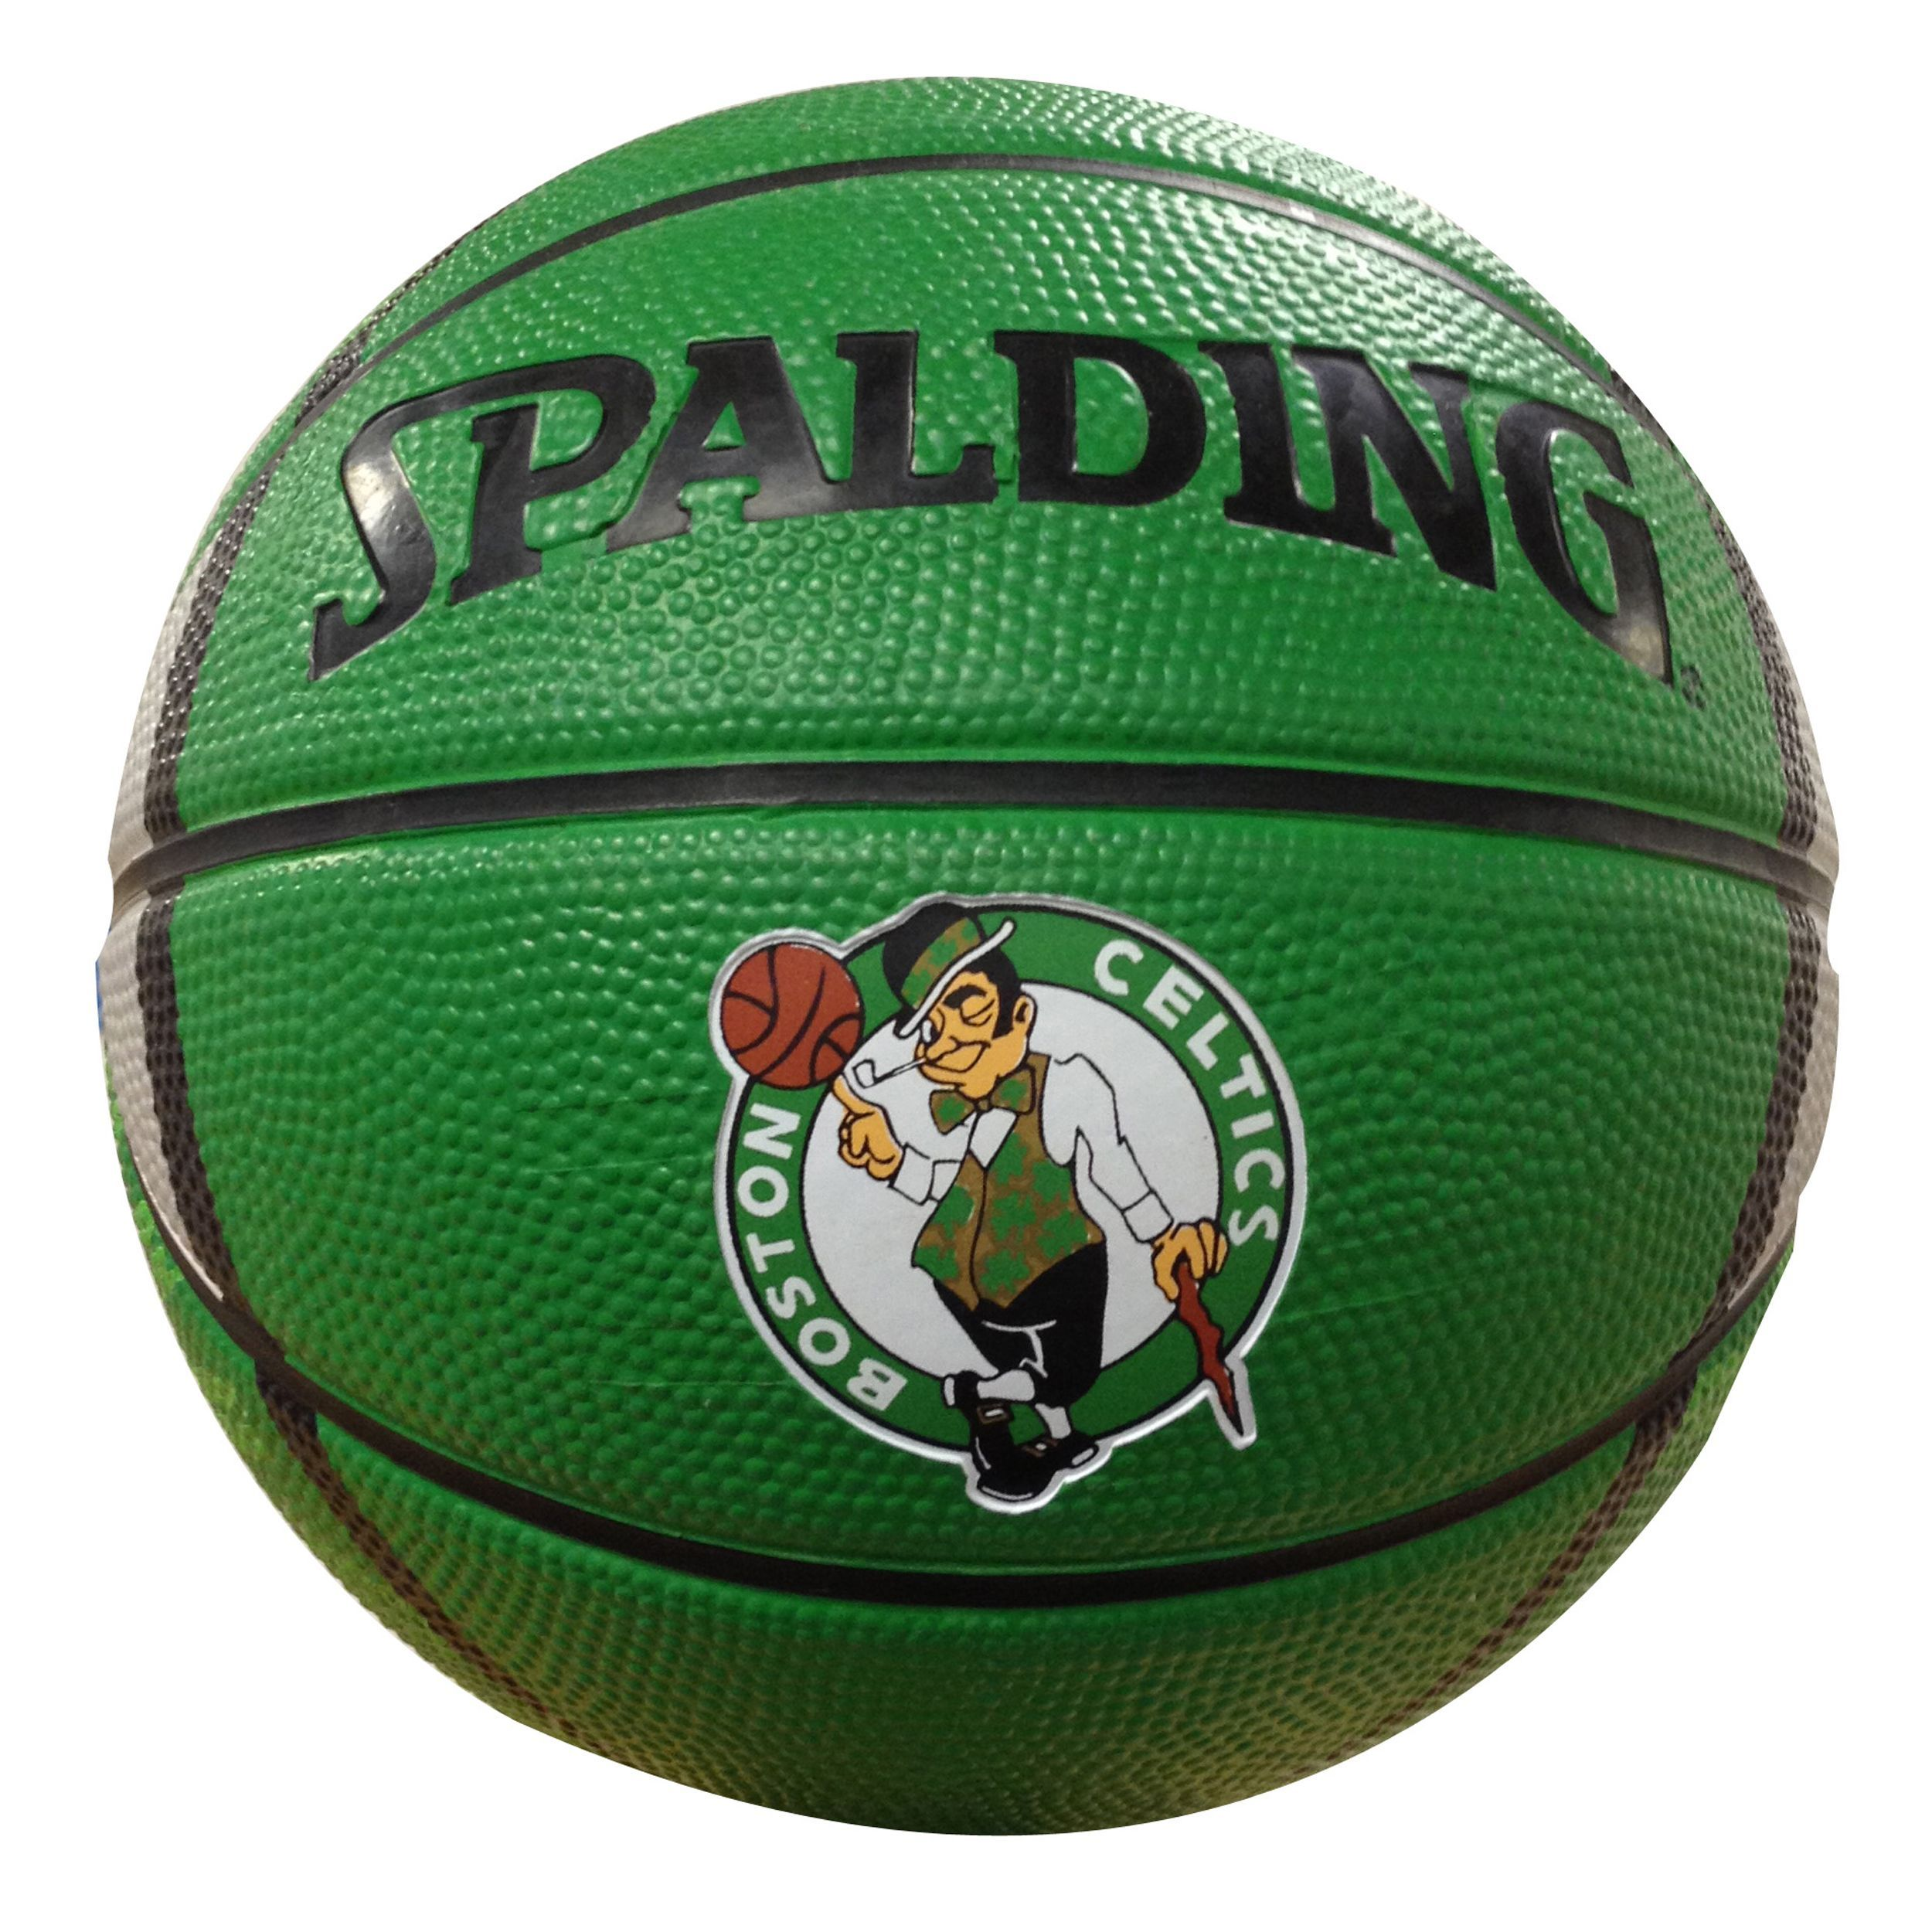 Overstock Com Online Shopping Bedding Furniture Electronics Jewelry Clothing More Celtics Basketball Mini Basketballs Boston Celtics [ 2500 x 2500 Pixel ]